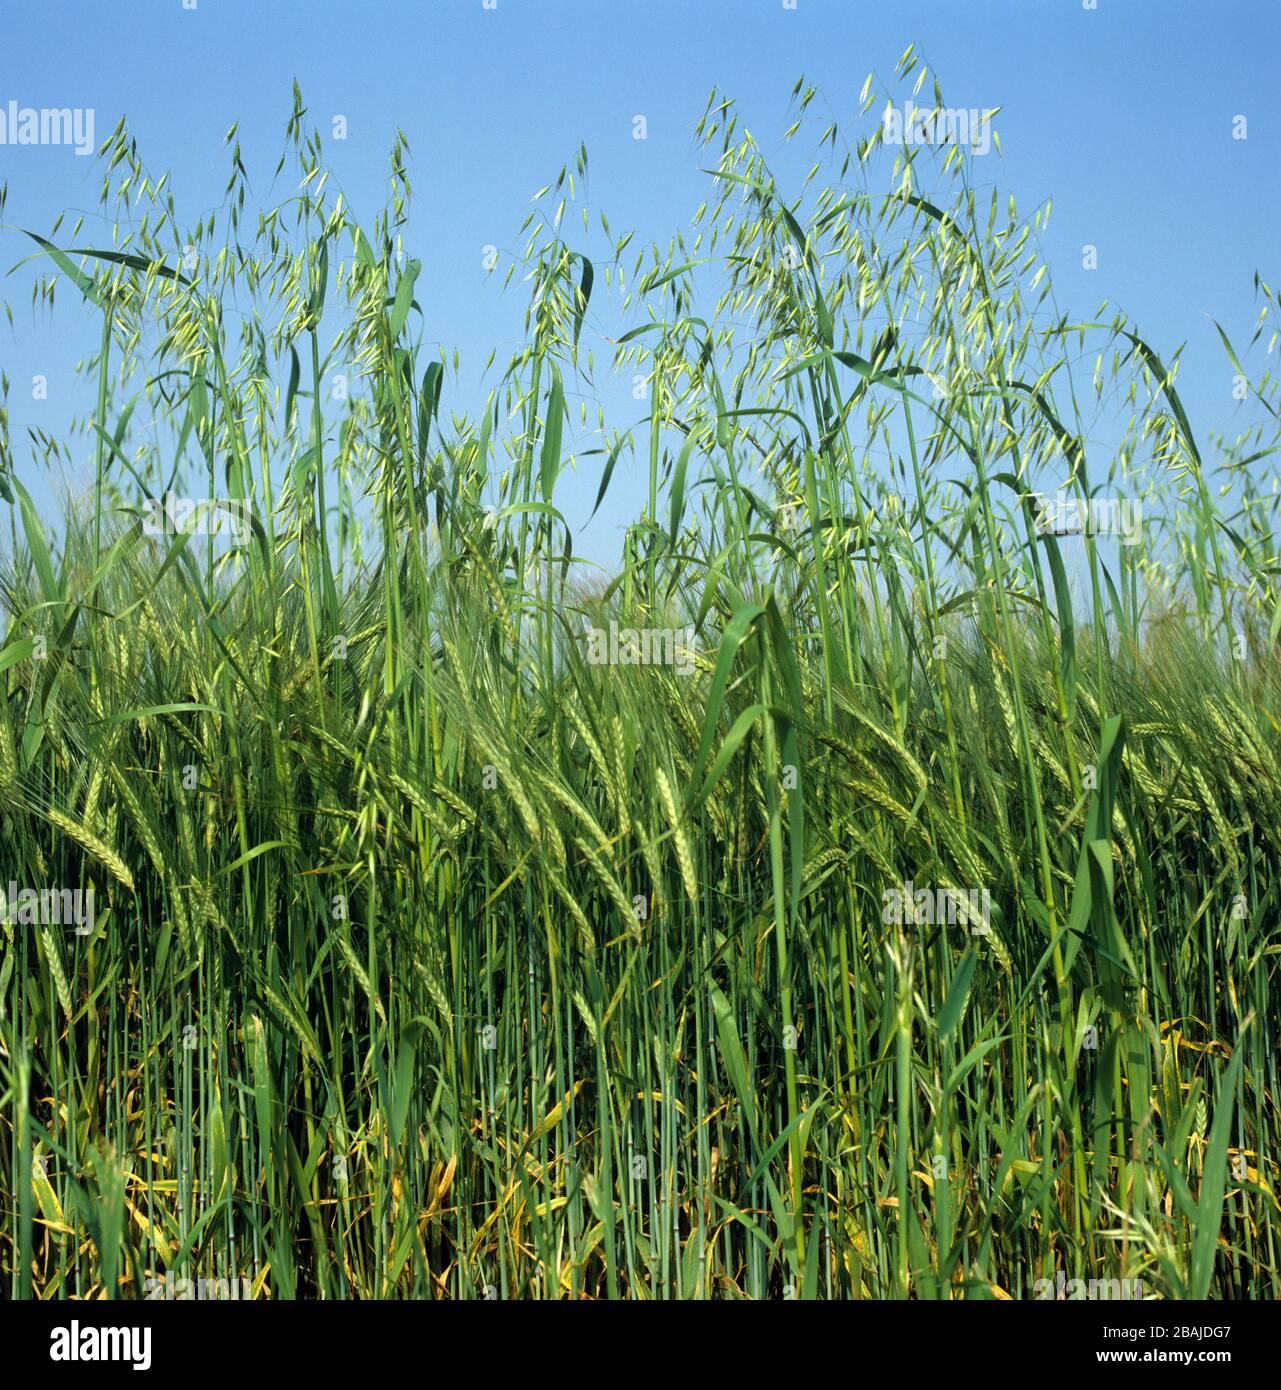 Wild oats (Avena fatua) annual arable grass weed flowering spikes in barley crop in green ear Stock Photo